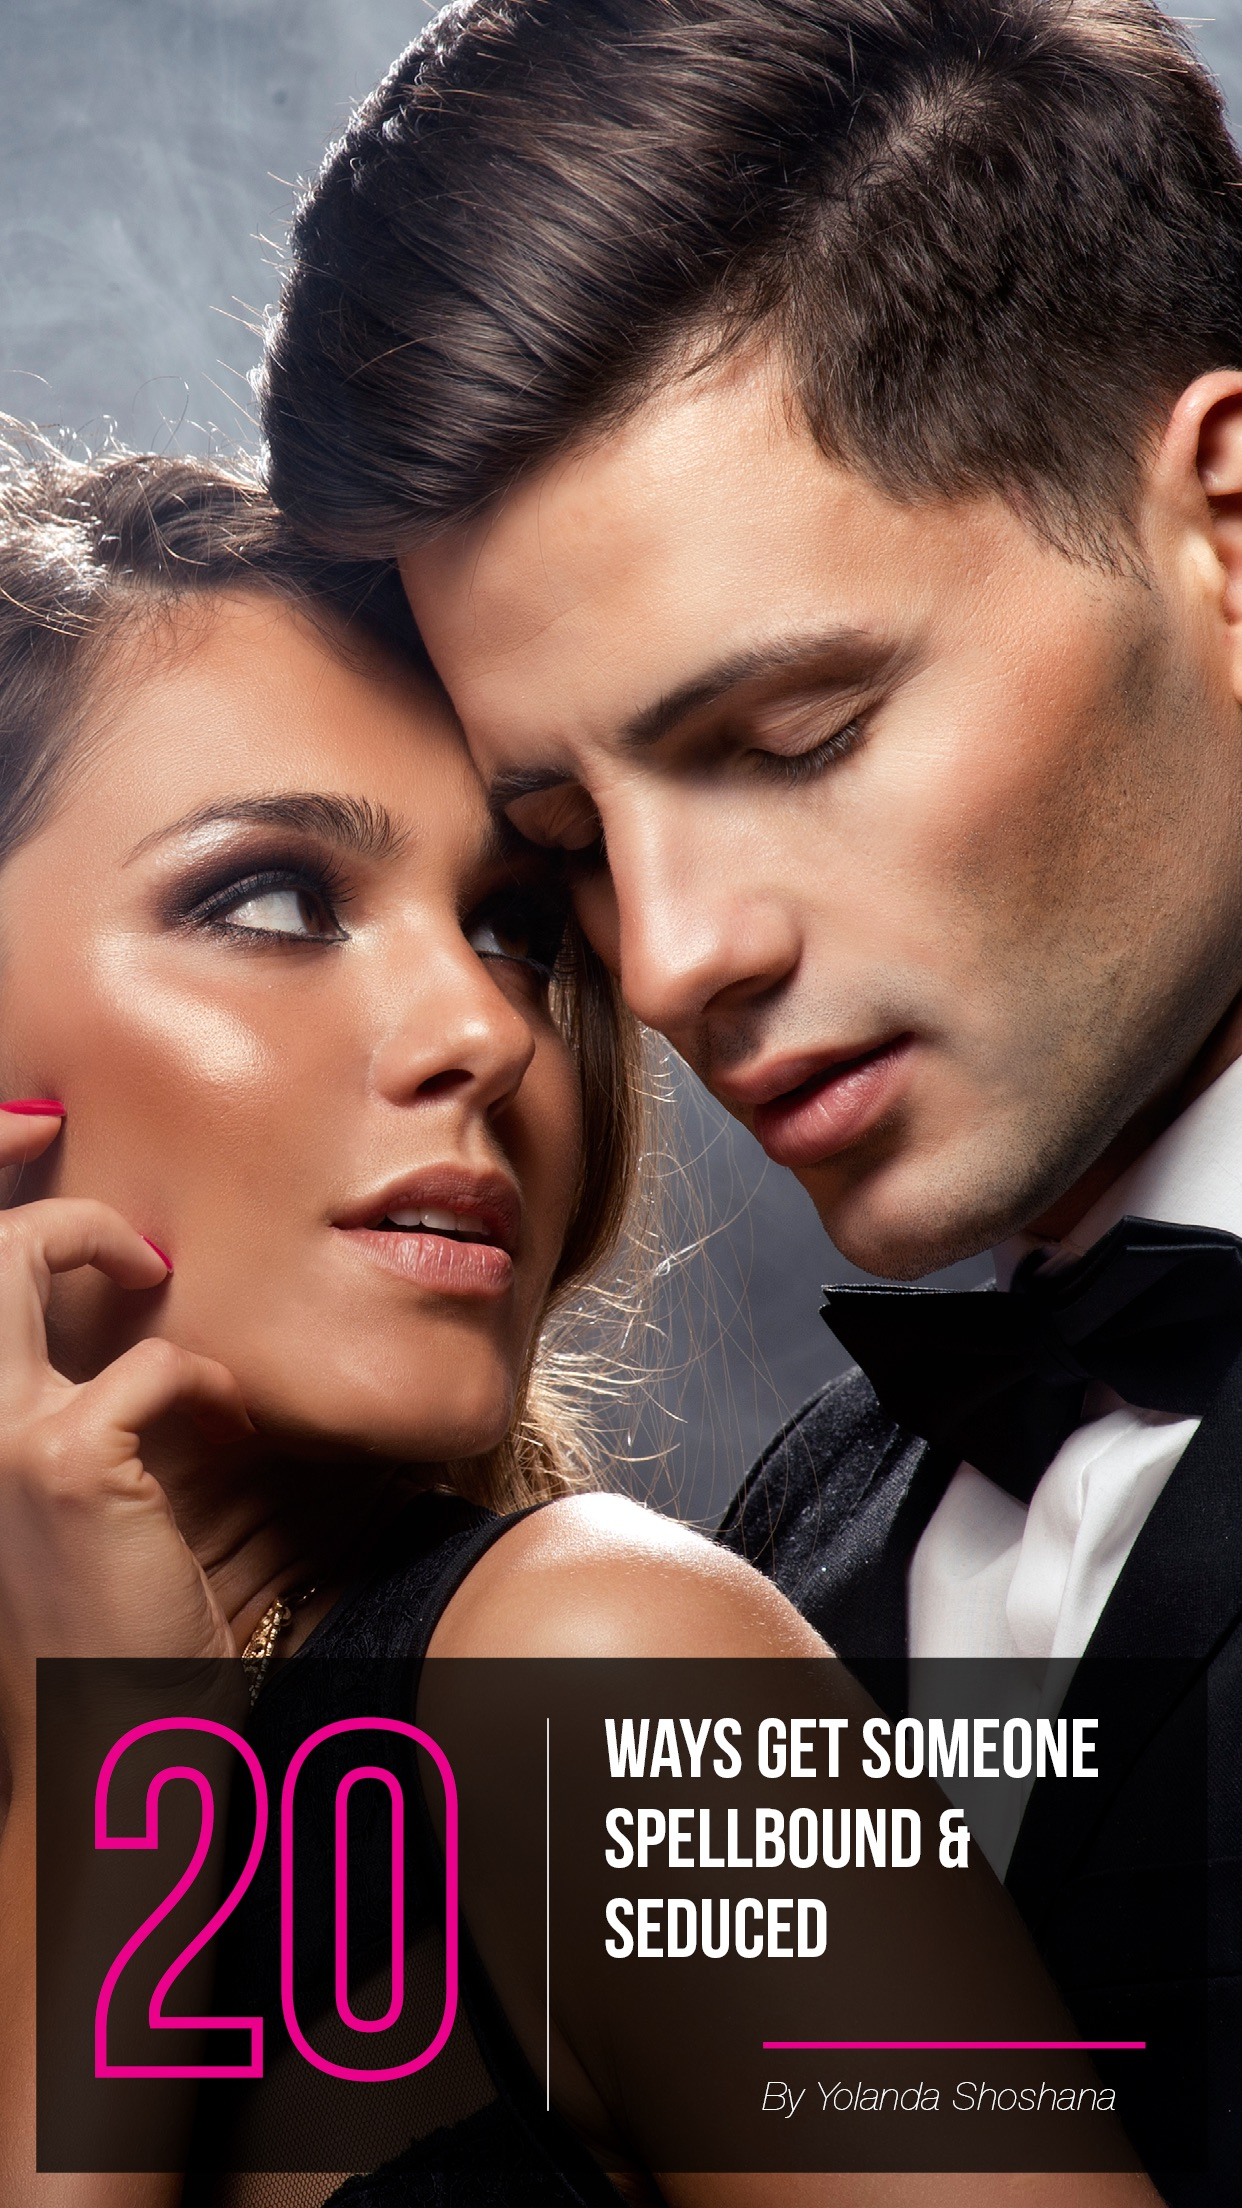 Naughty Girl Mag - Women's Sex & Lifestyle Advice Screenshot